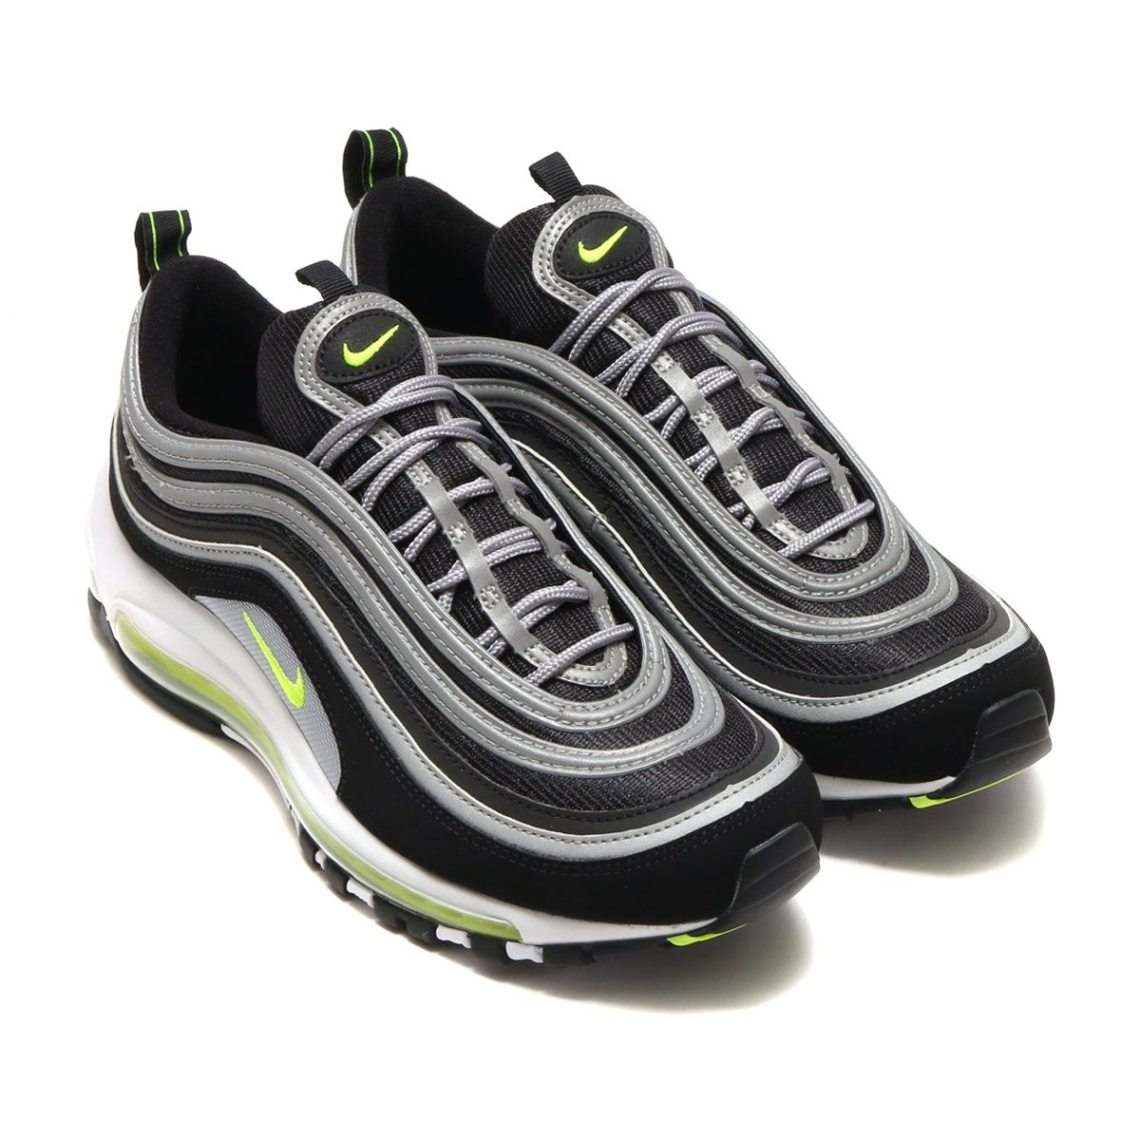 newest collection fc6de f3719 Style  921826-004. Nike Air Max 97 BlackVolt